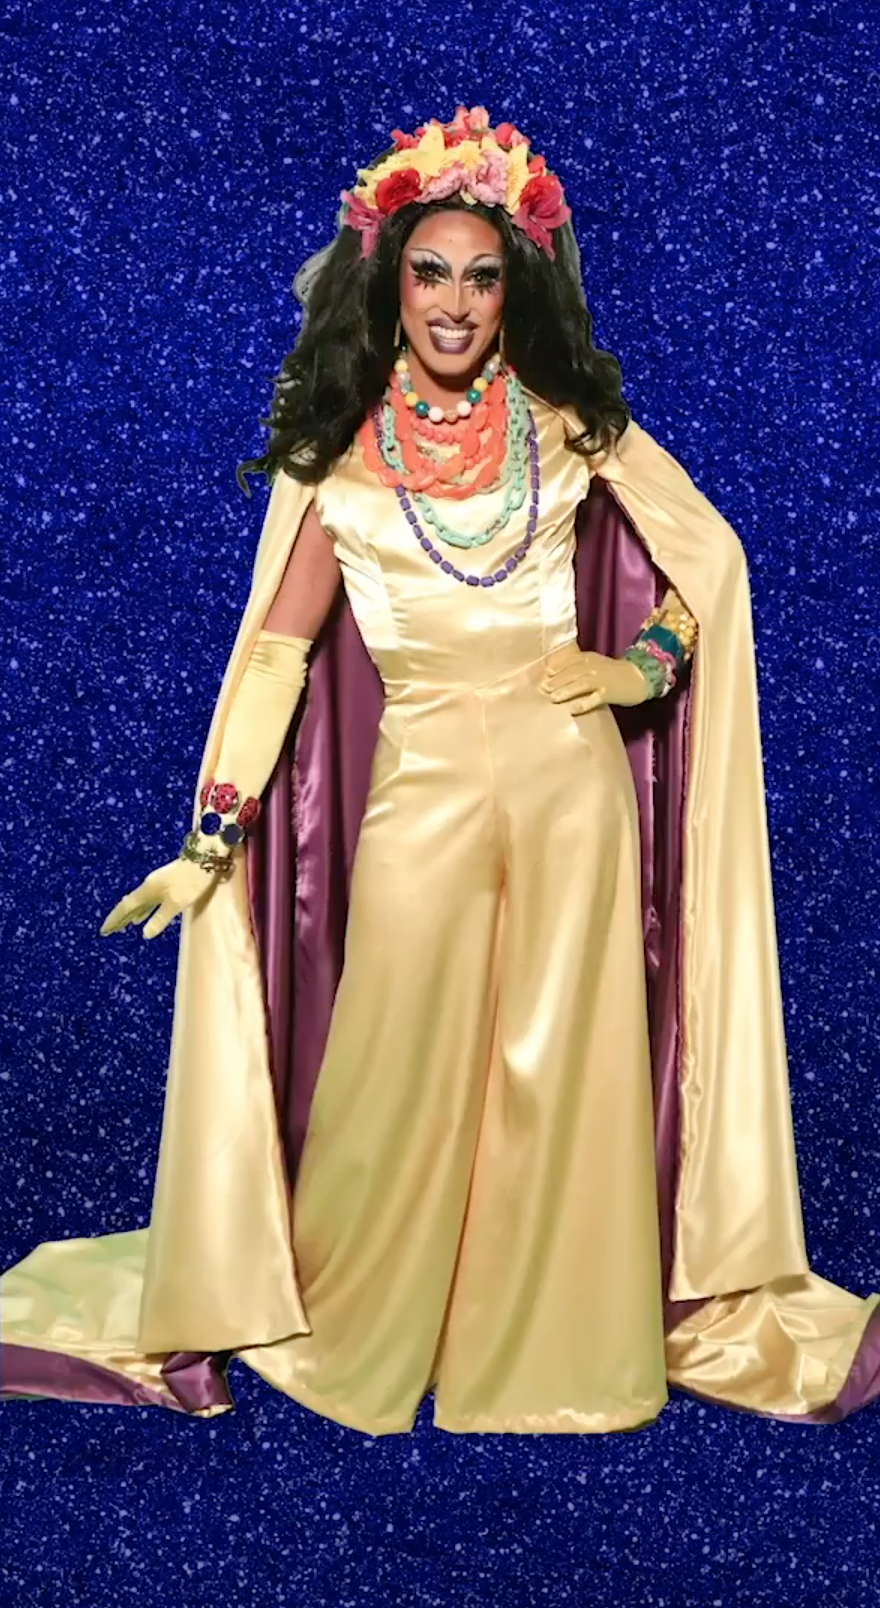 Gay's Anatomy Crystal Methyd